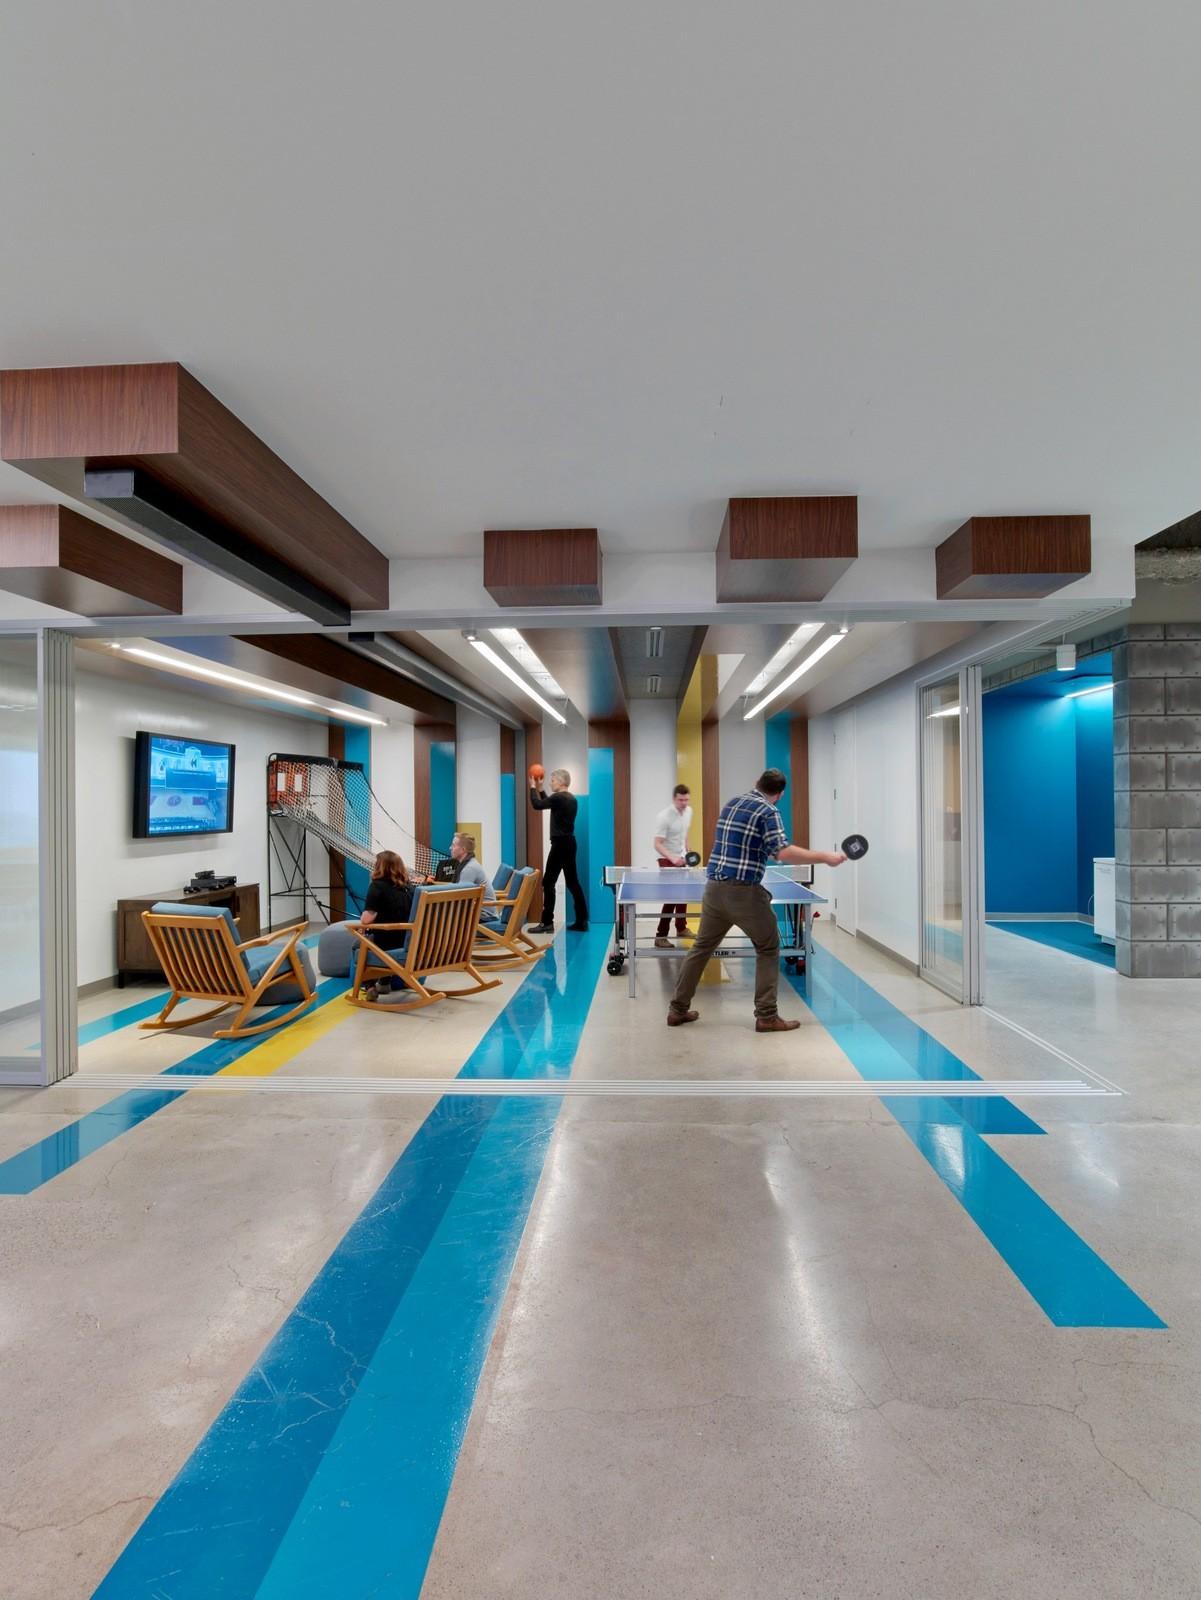 A Tour of LinkedIns Beautiful New Toronto Office